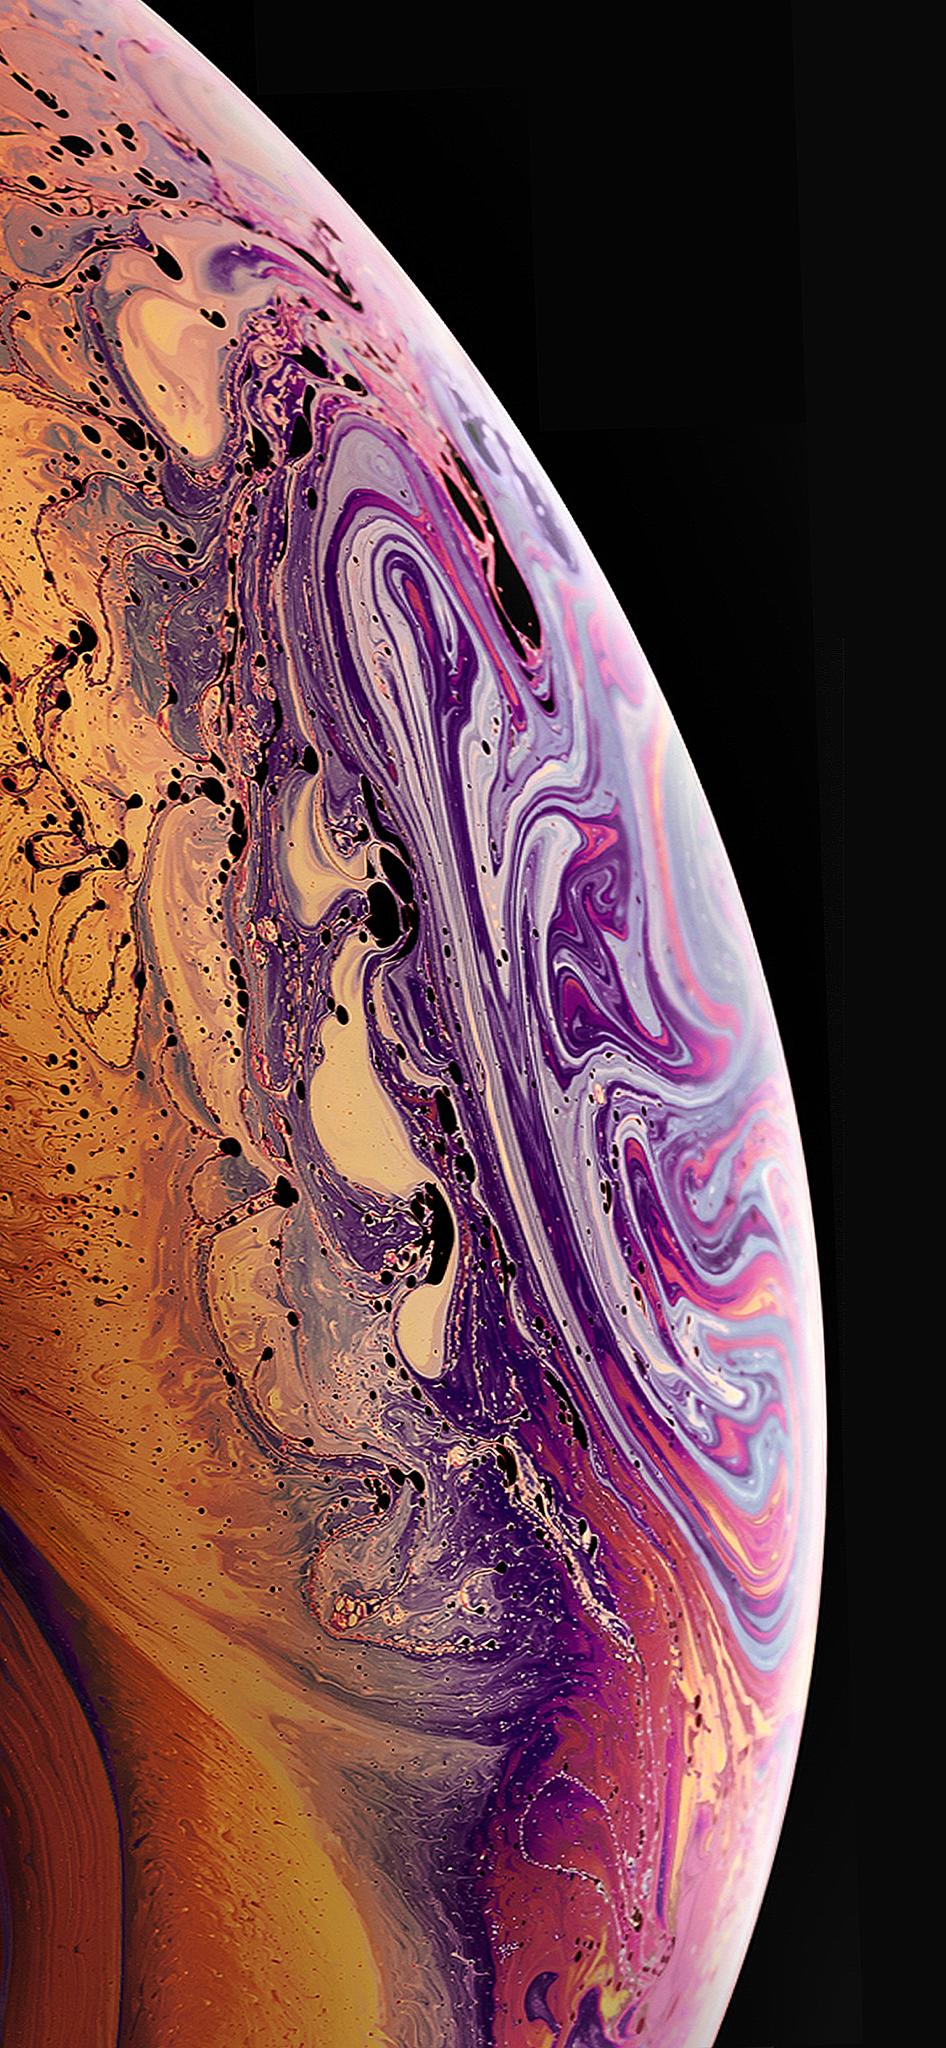 Iphone Xr Xs Wallpapers Hd Apple Wallpaper Iphone Iphone Homescreen Wallpaper Original Iphone Wallpaper